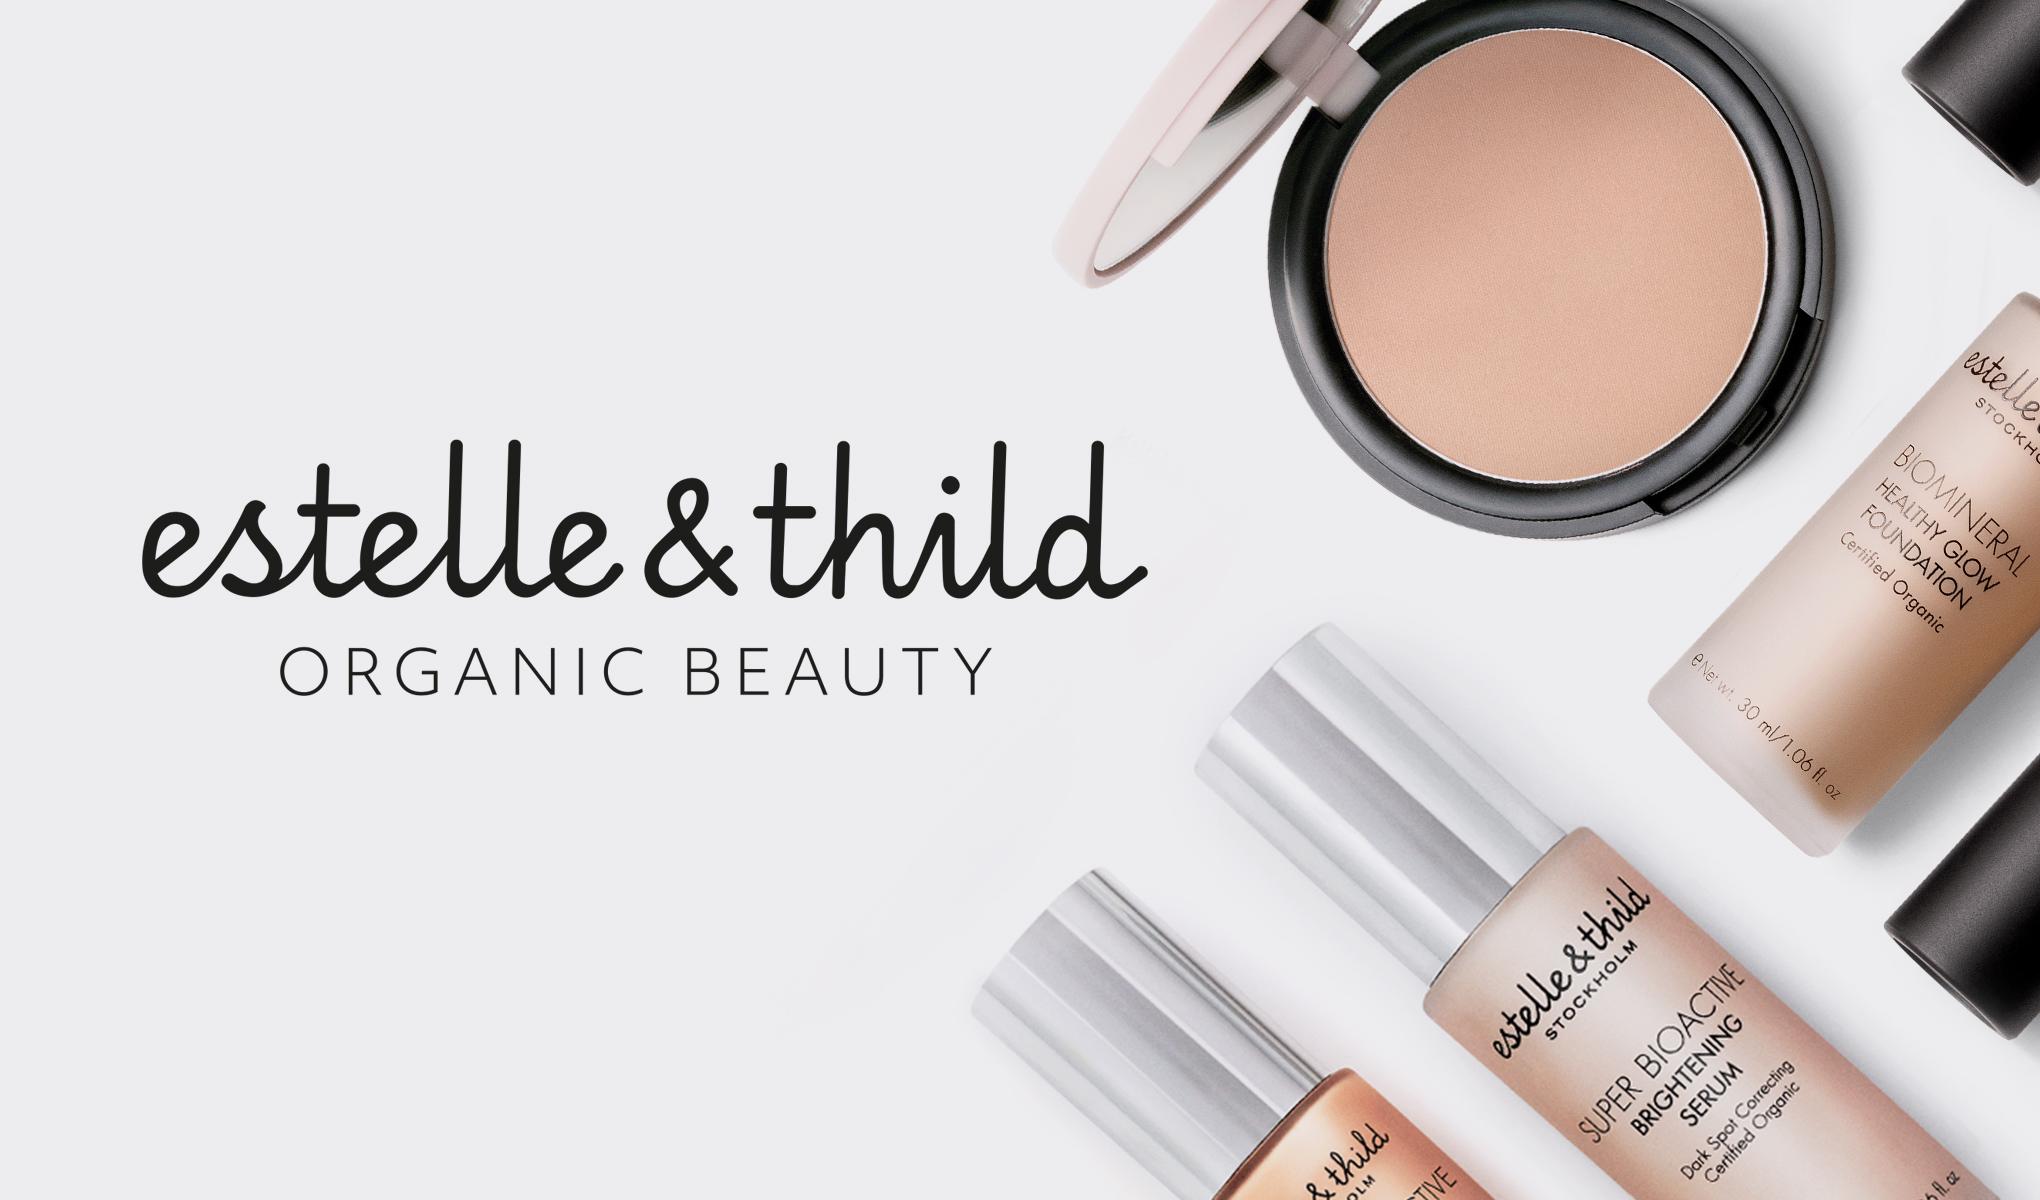 Estelle & Thild